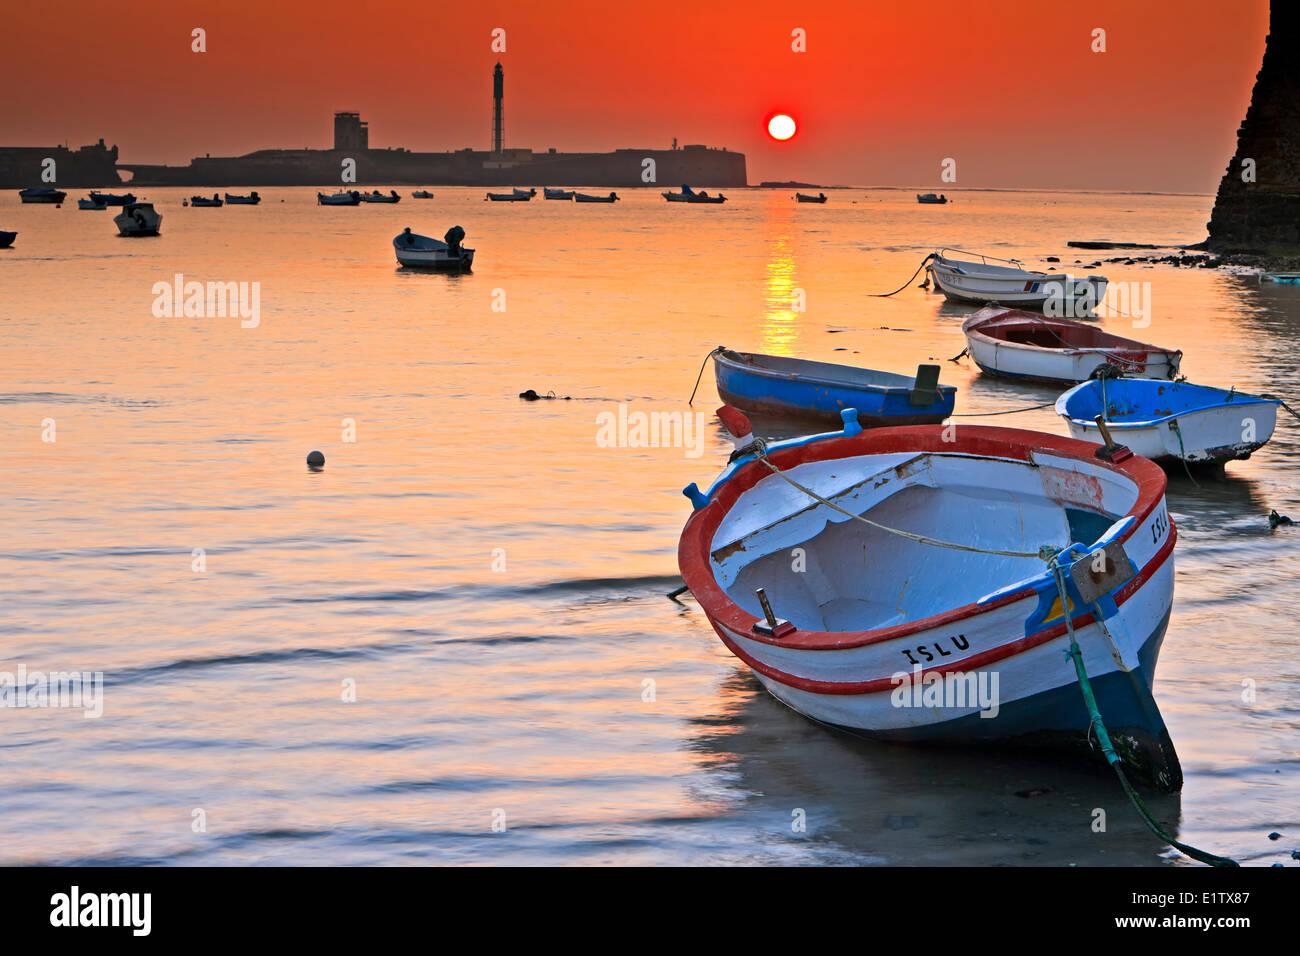 Small fishing boats anchored at Playa de la Caleta at sunset in the City of Cadiz, Province of Cadiz, Costa de la - Stock Image